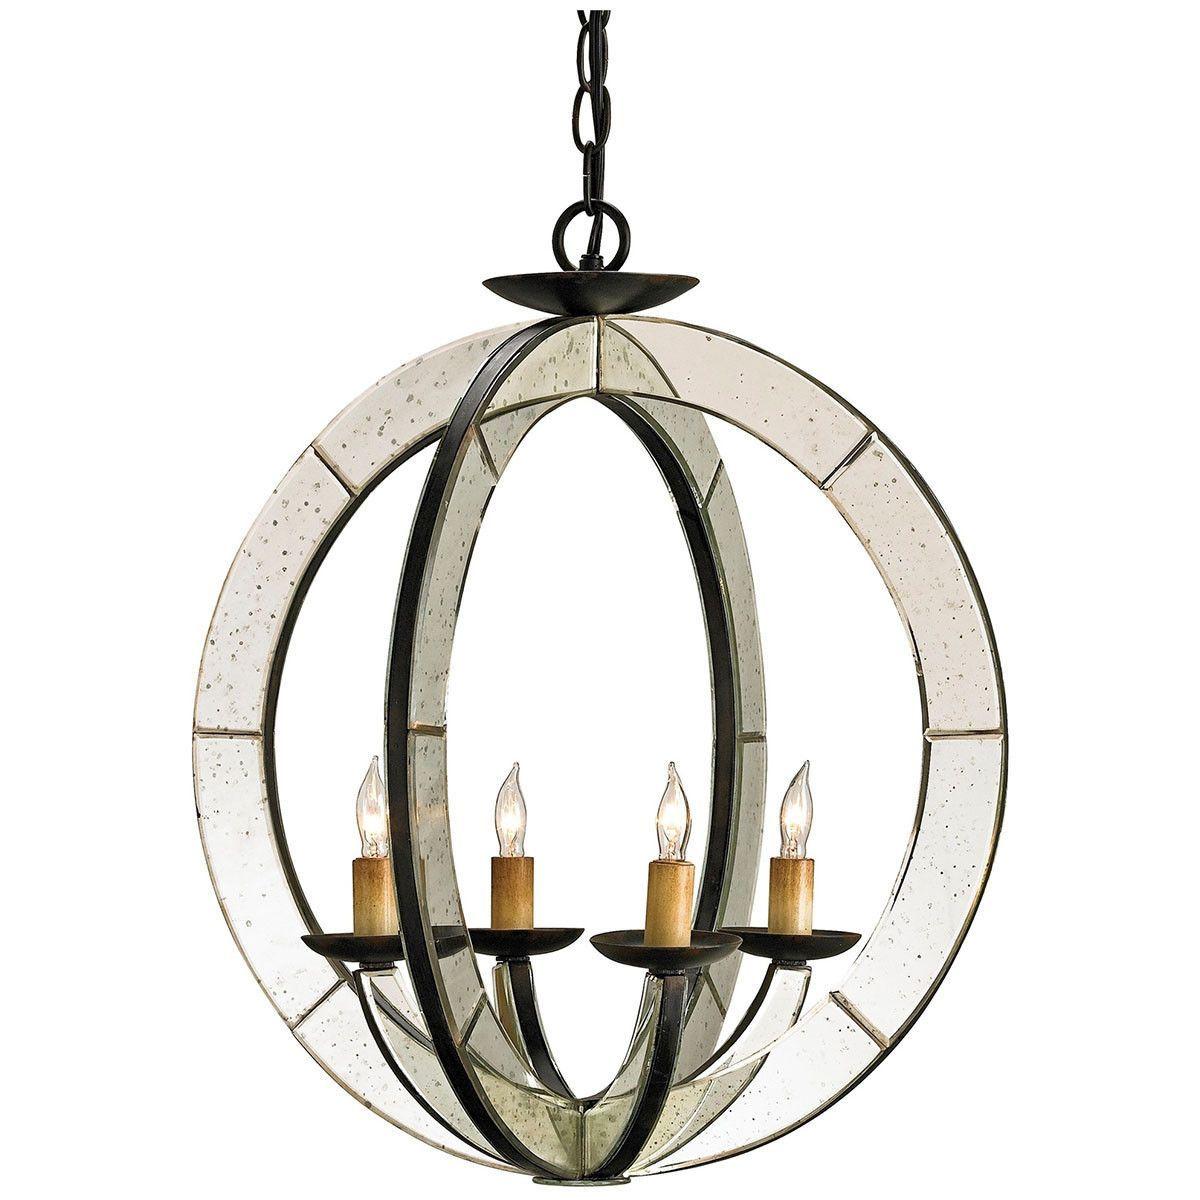 Currey and company meridian chandelier 9400 60 watt light bulb currey and company meridian chandelier 9400 arubaitofo Gallery